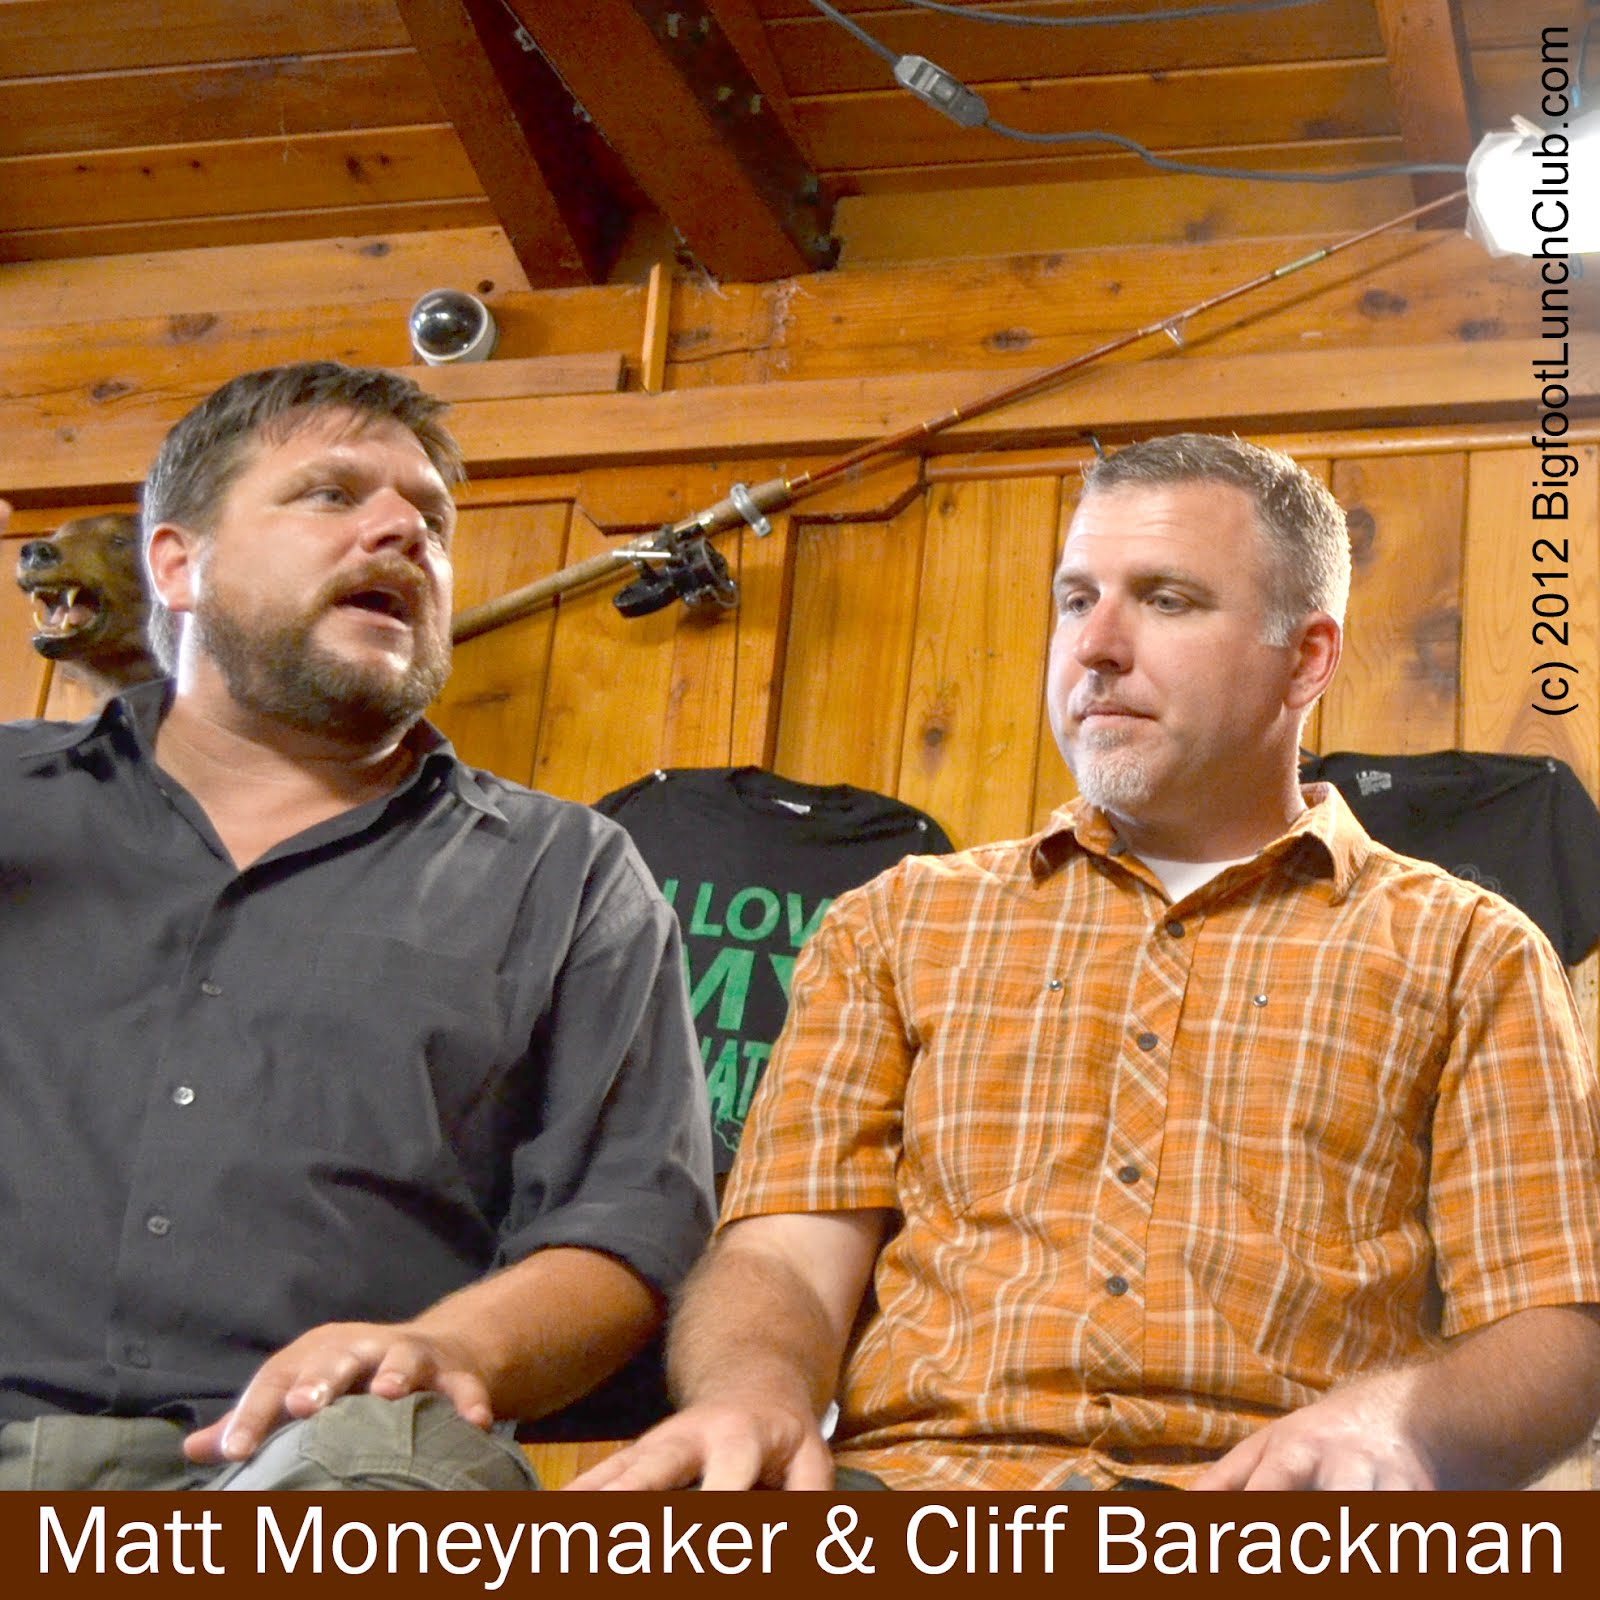 Bigfoot News Lunch Club Finding Celana Pendek Motif Tartan Blx510 New York Times How To Hunt